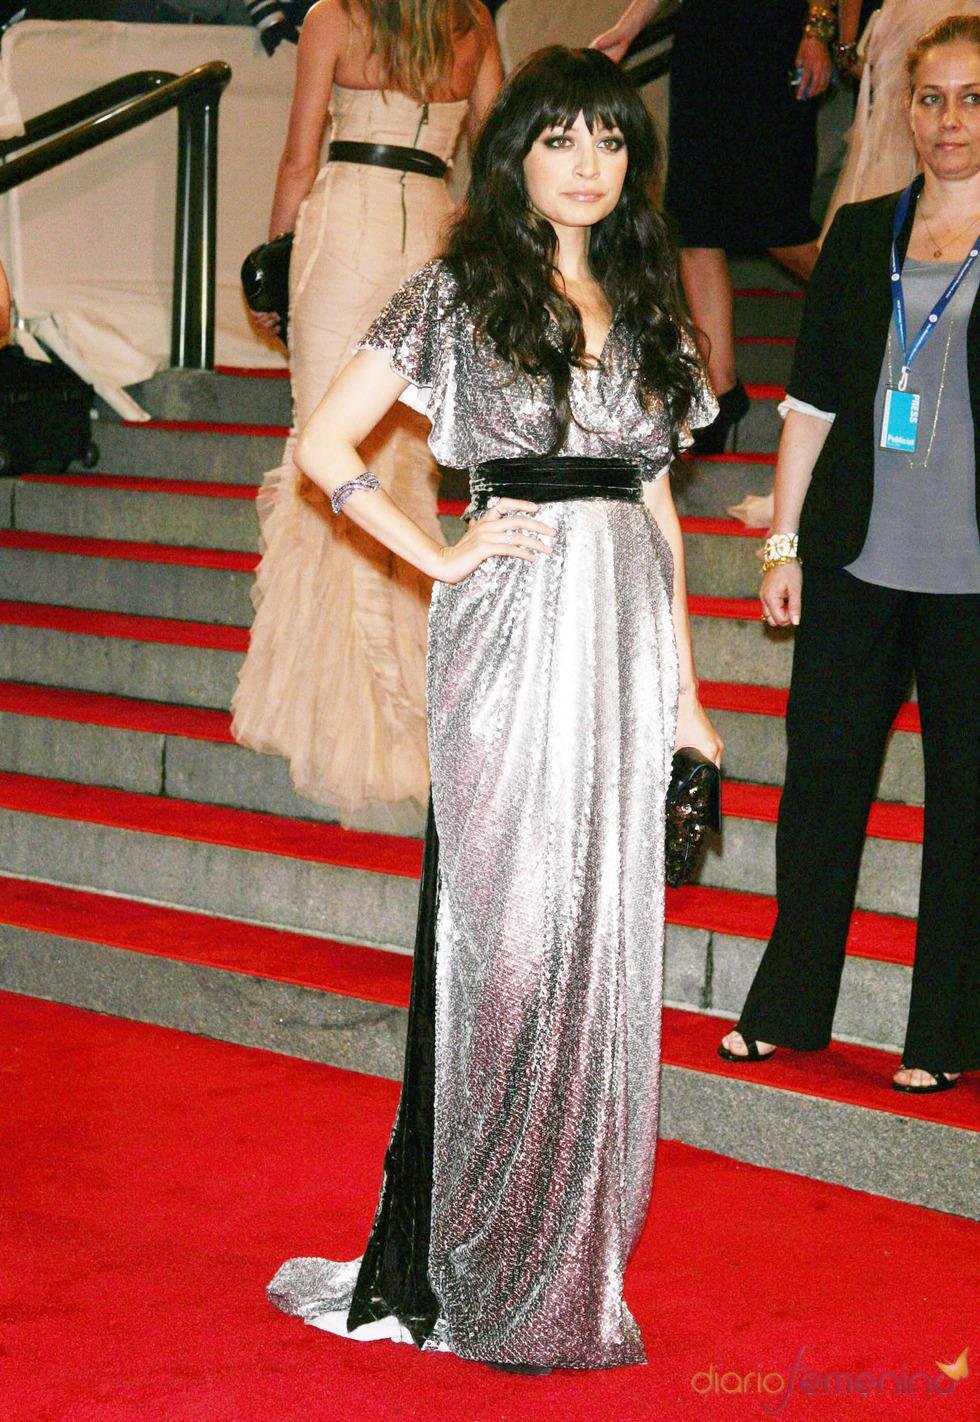 Nicole Richie en la gala del Costume Institute